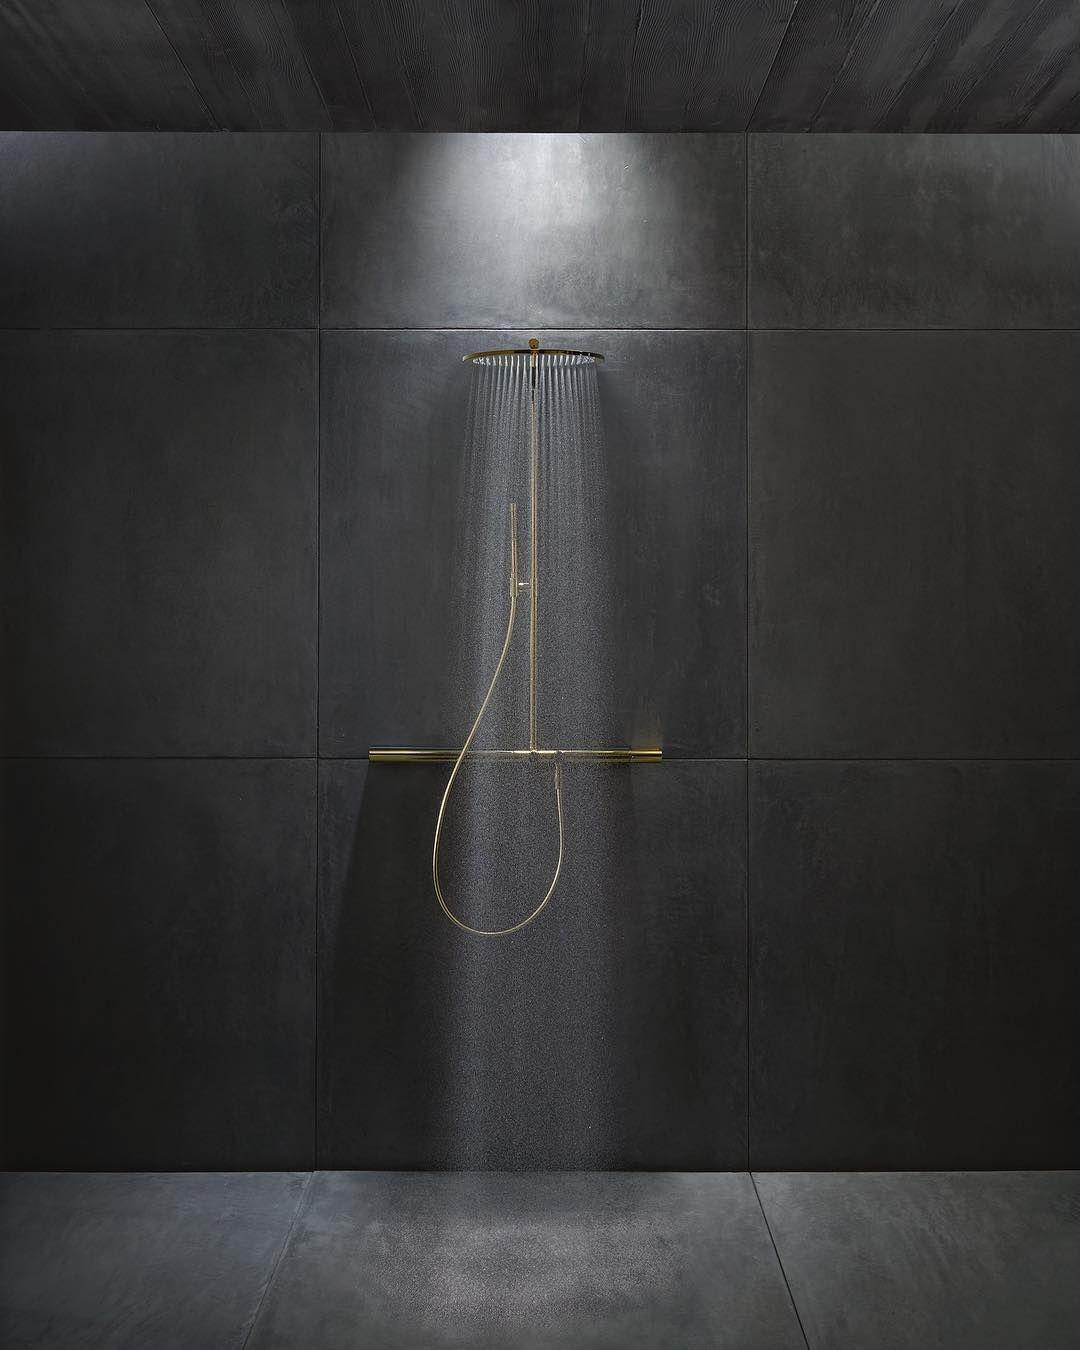 New AXOR showerpipe. Expressive. Elegant.  #AXOR #AXORnordic #FormFollowsPerfection #design #interior #interiordesign #interiordecor #bathroom #bathroomdesign #bathroomdecor #baderomsinspo #interiorinspirasjon #inredning #sisustusinspiraatio #sisustussuun